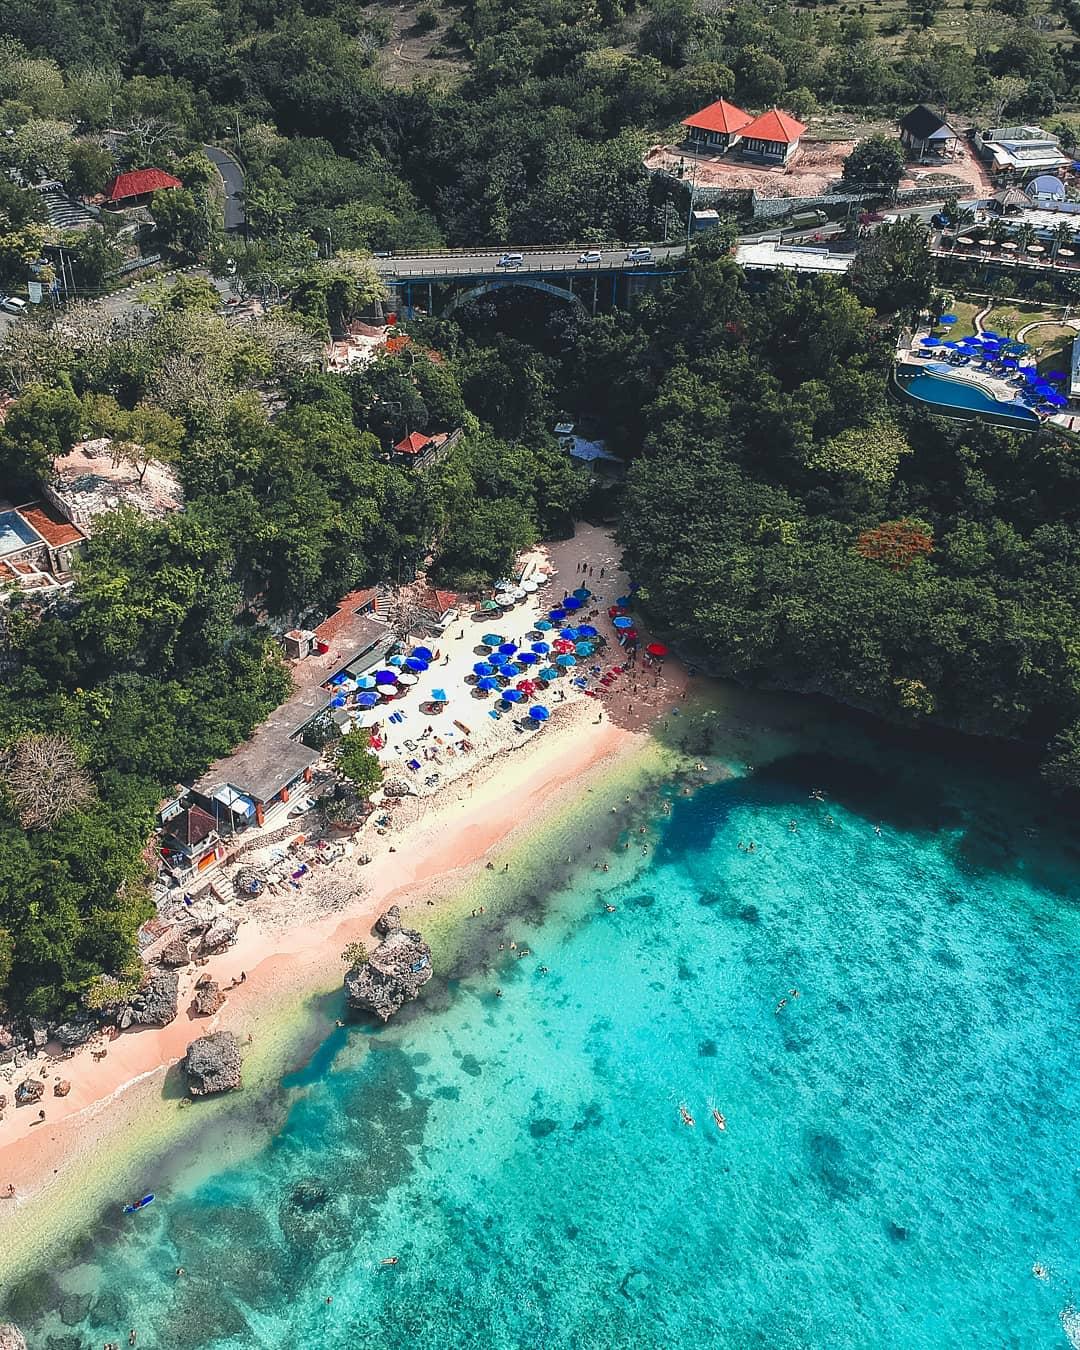 Pantai Labuan Sait Pecatu Bali Drone View - Dewata ID